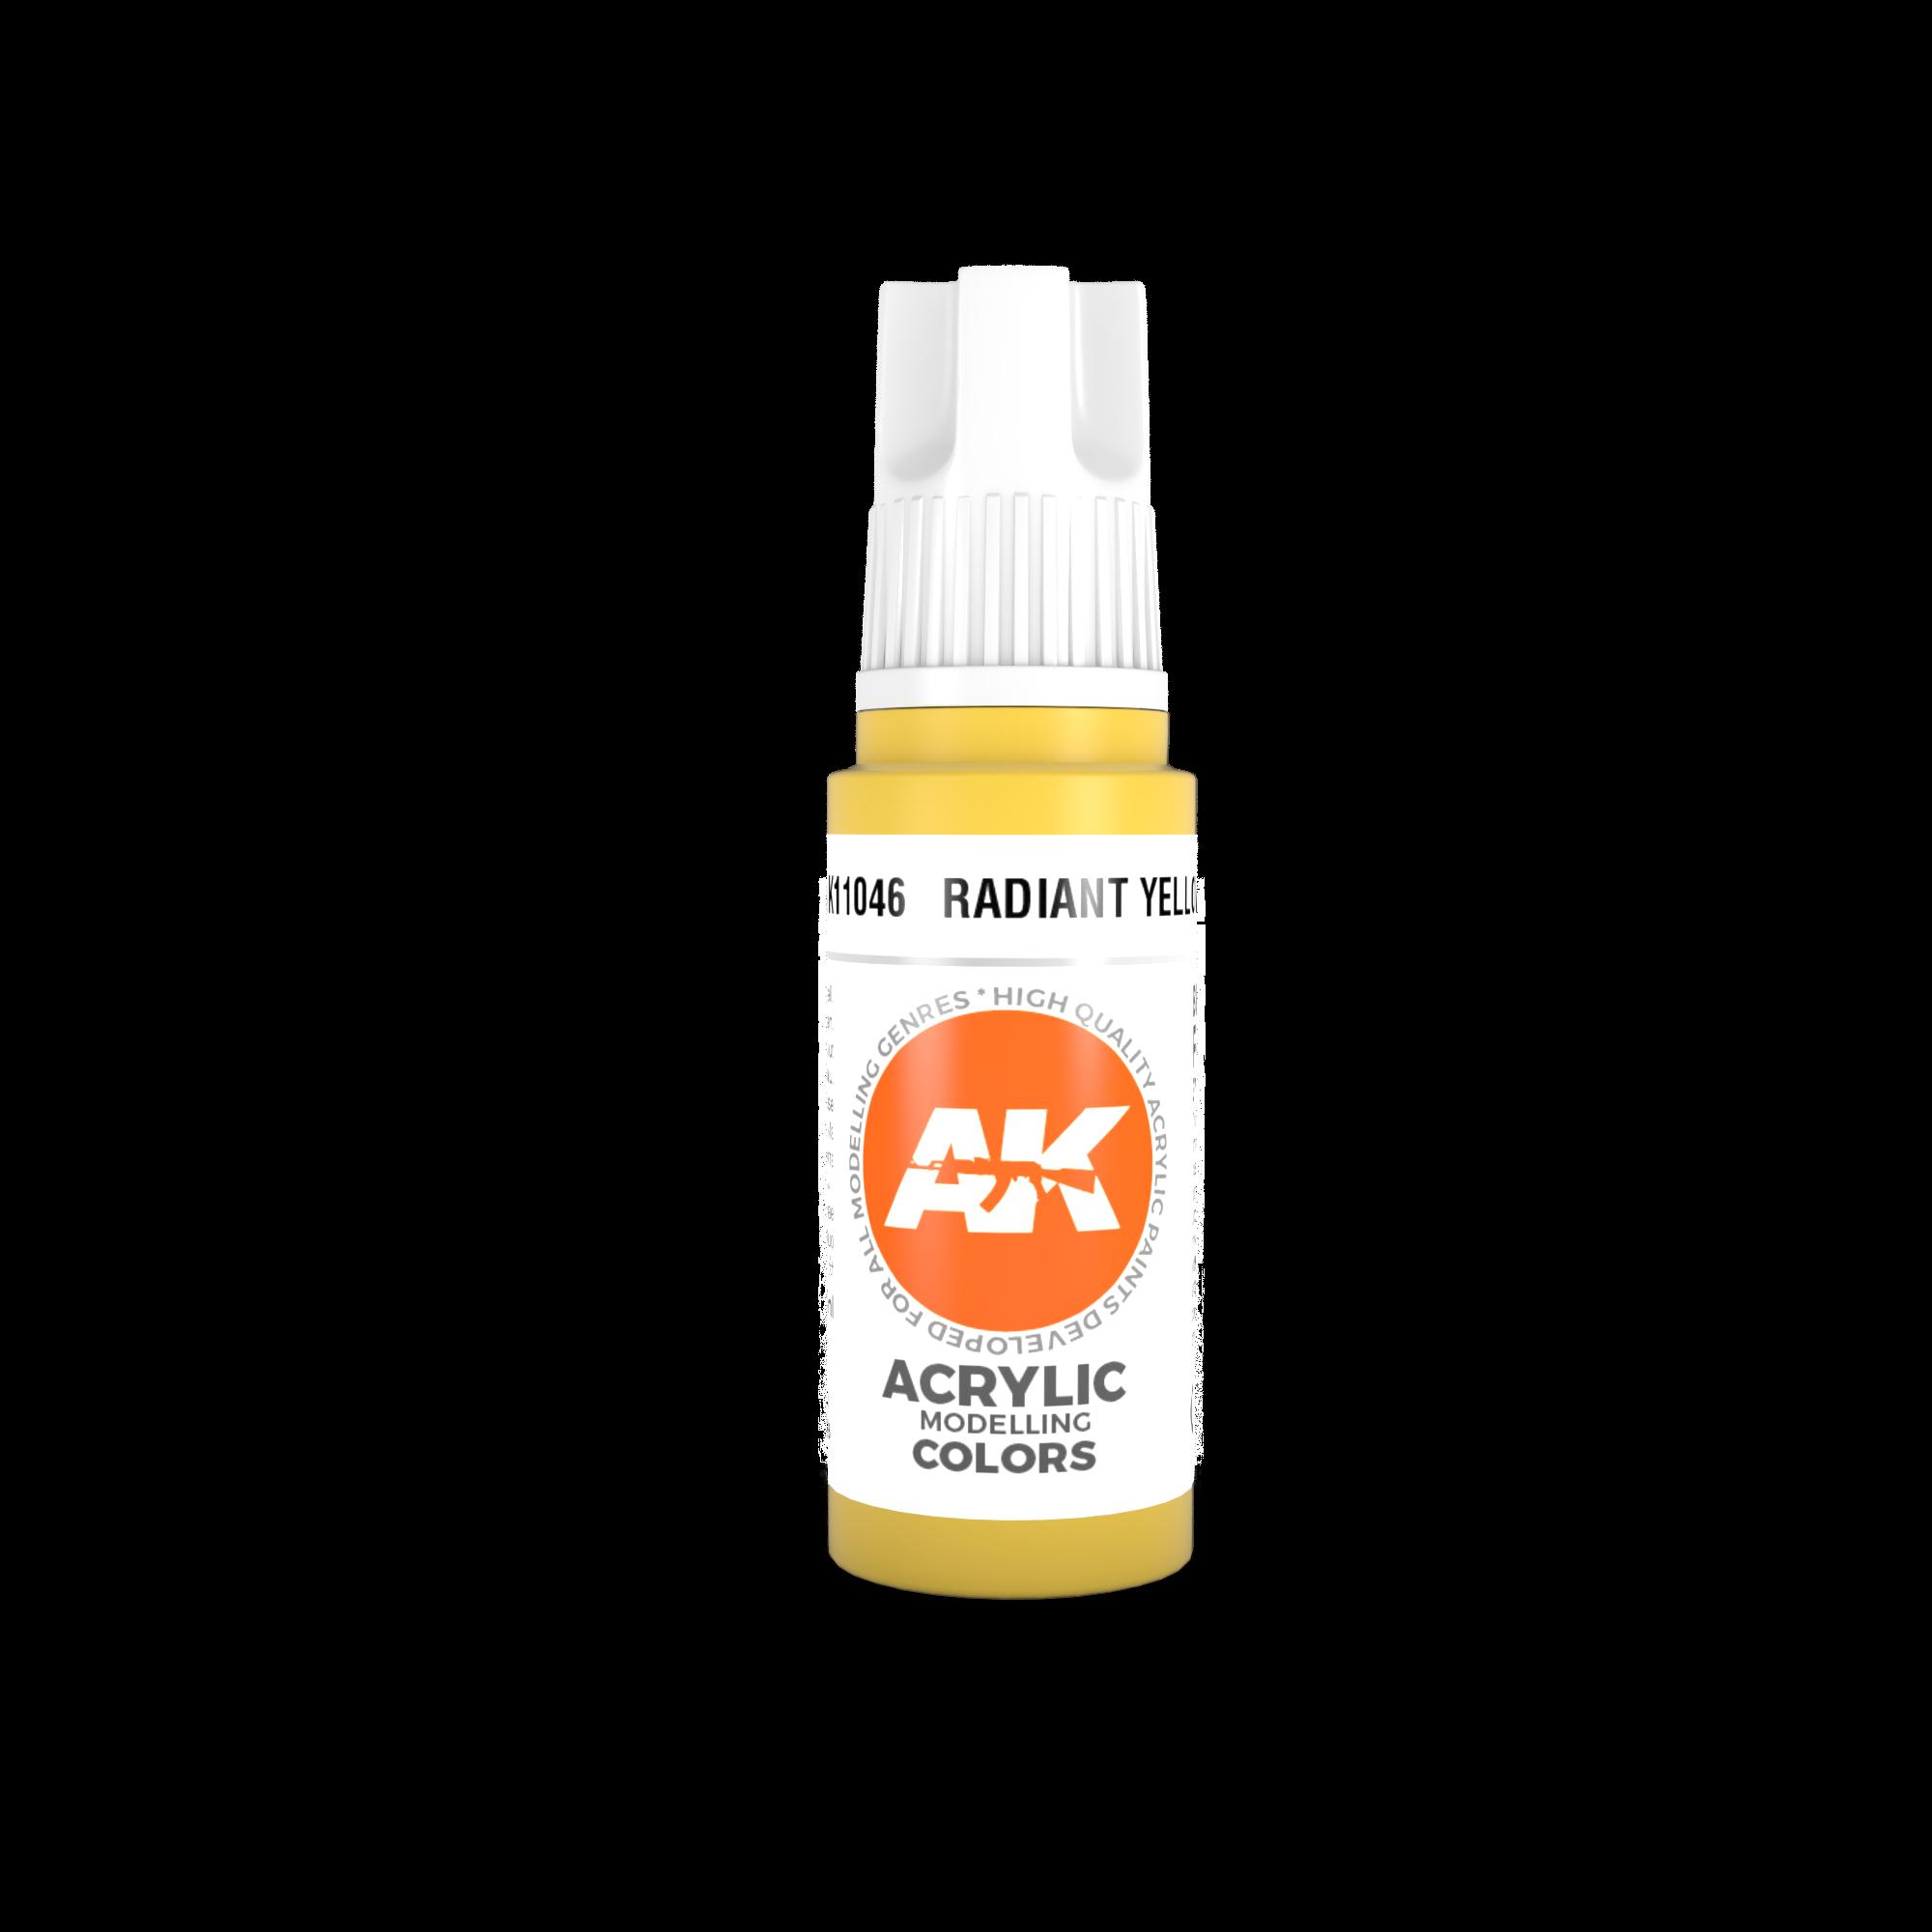 AK-Interactive Radiant Yellow Acrylic Modelling Color - 17ml - AK-11046